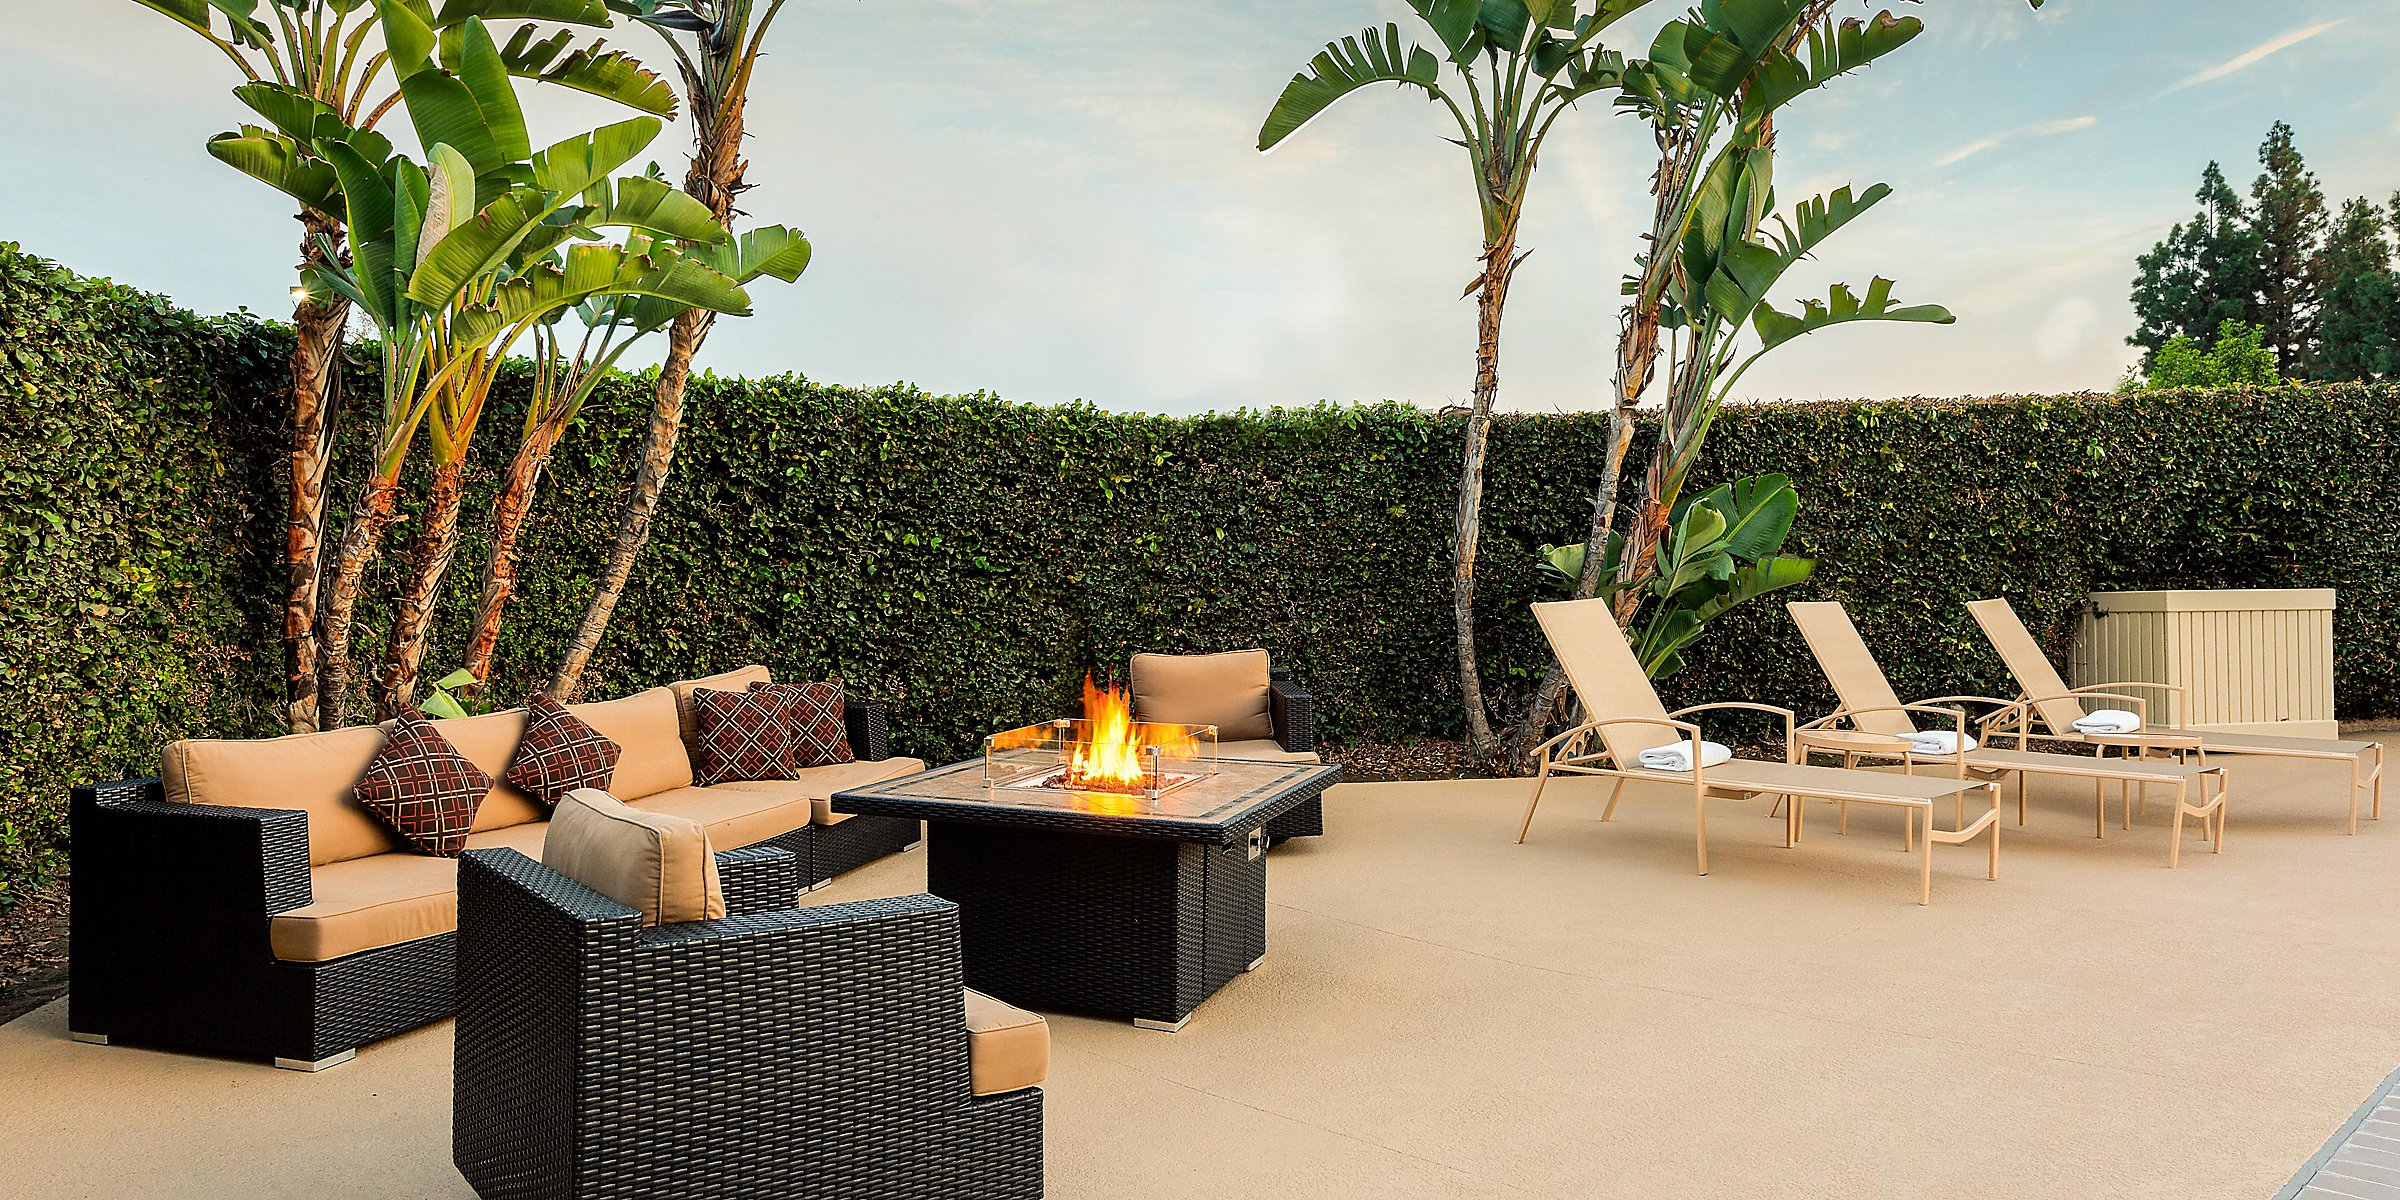 La Mirada, CA Hotels near Buena Park | Holiday Inn La Mirada